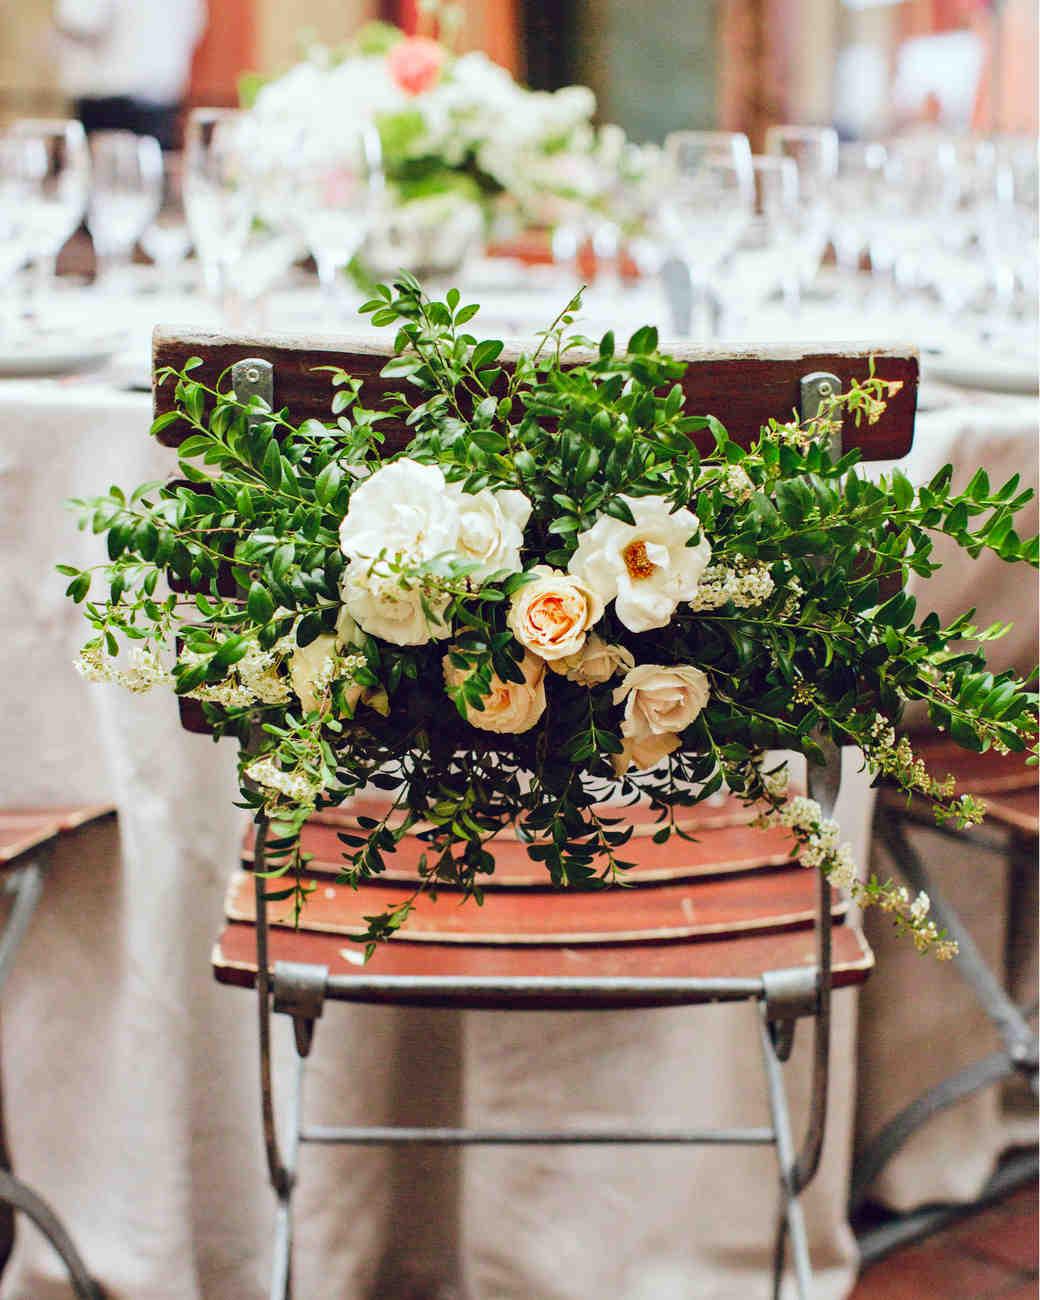 tina-raul-wedding-chair-0314.jpg